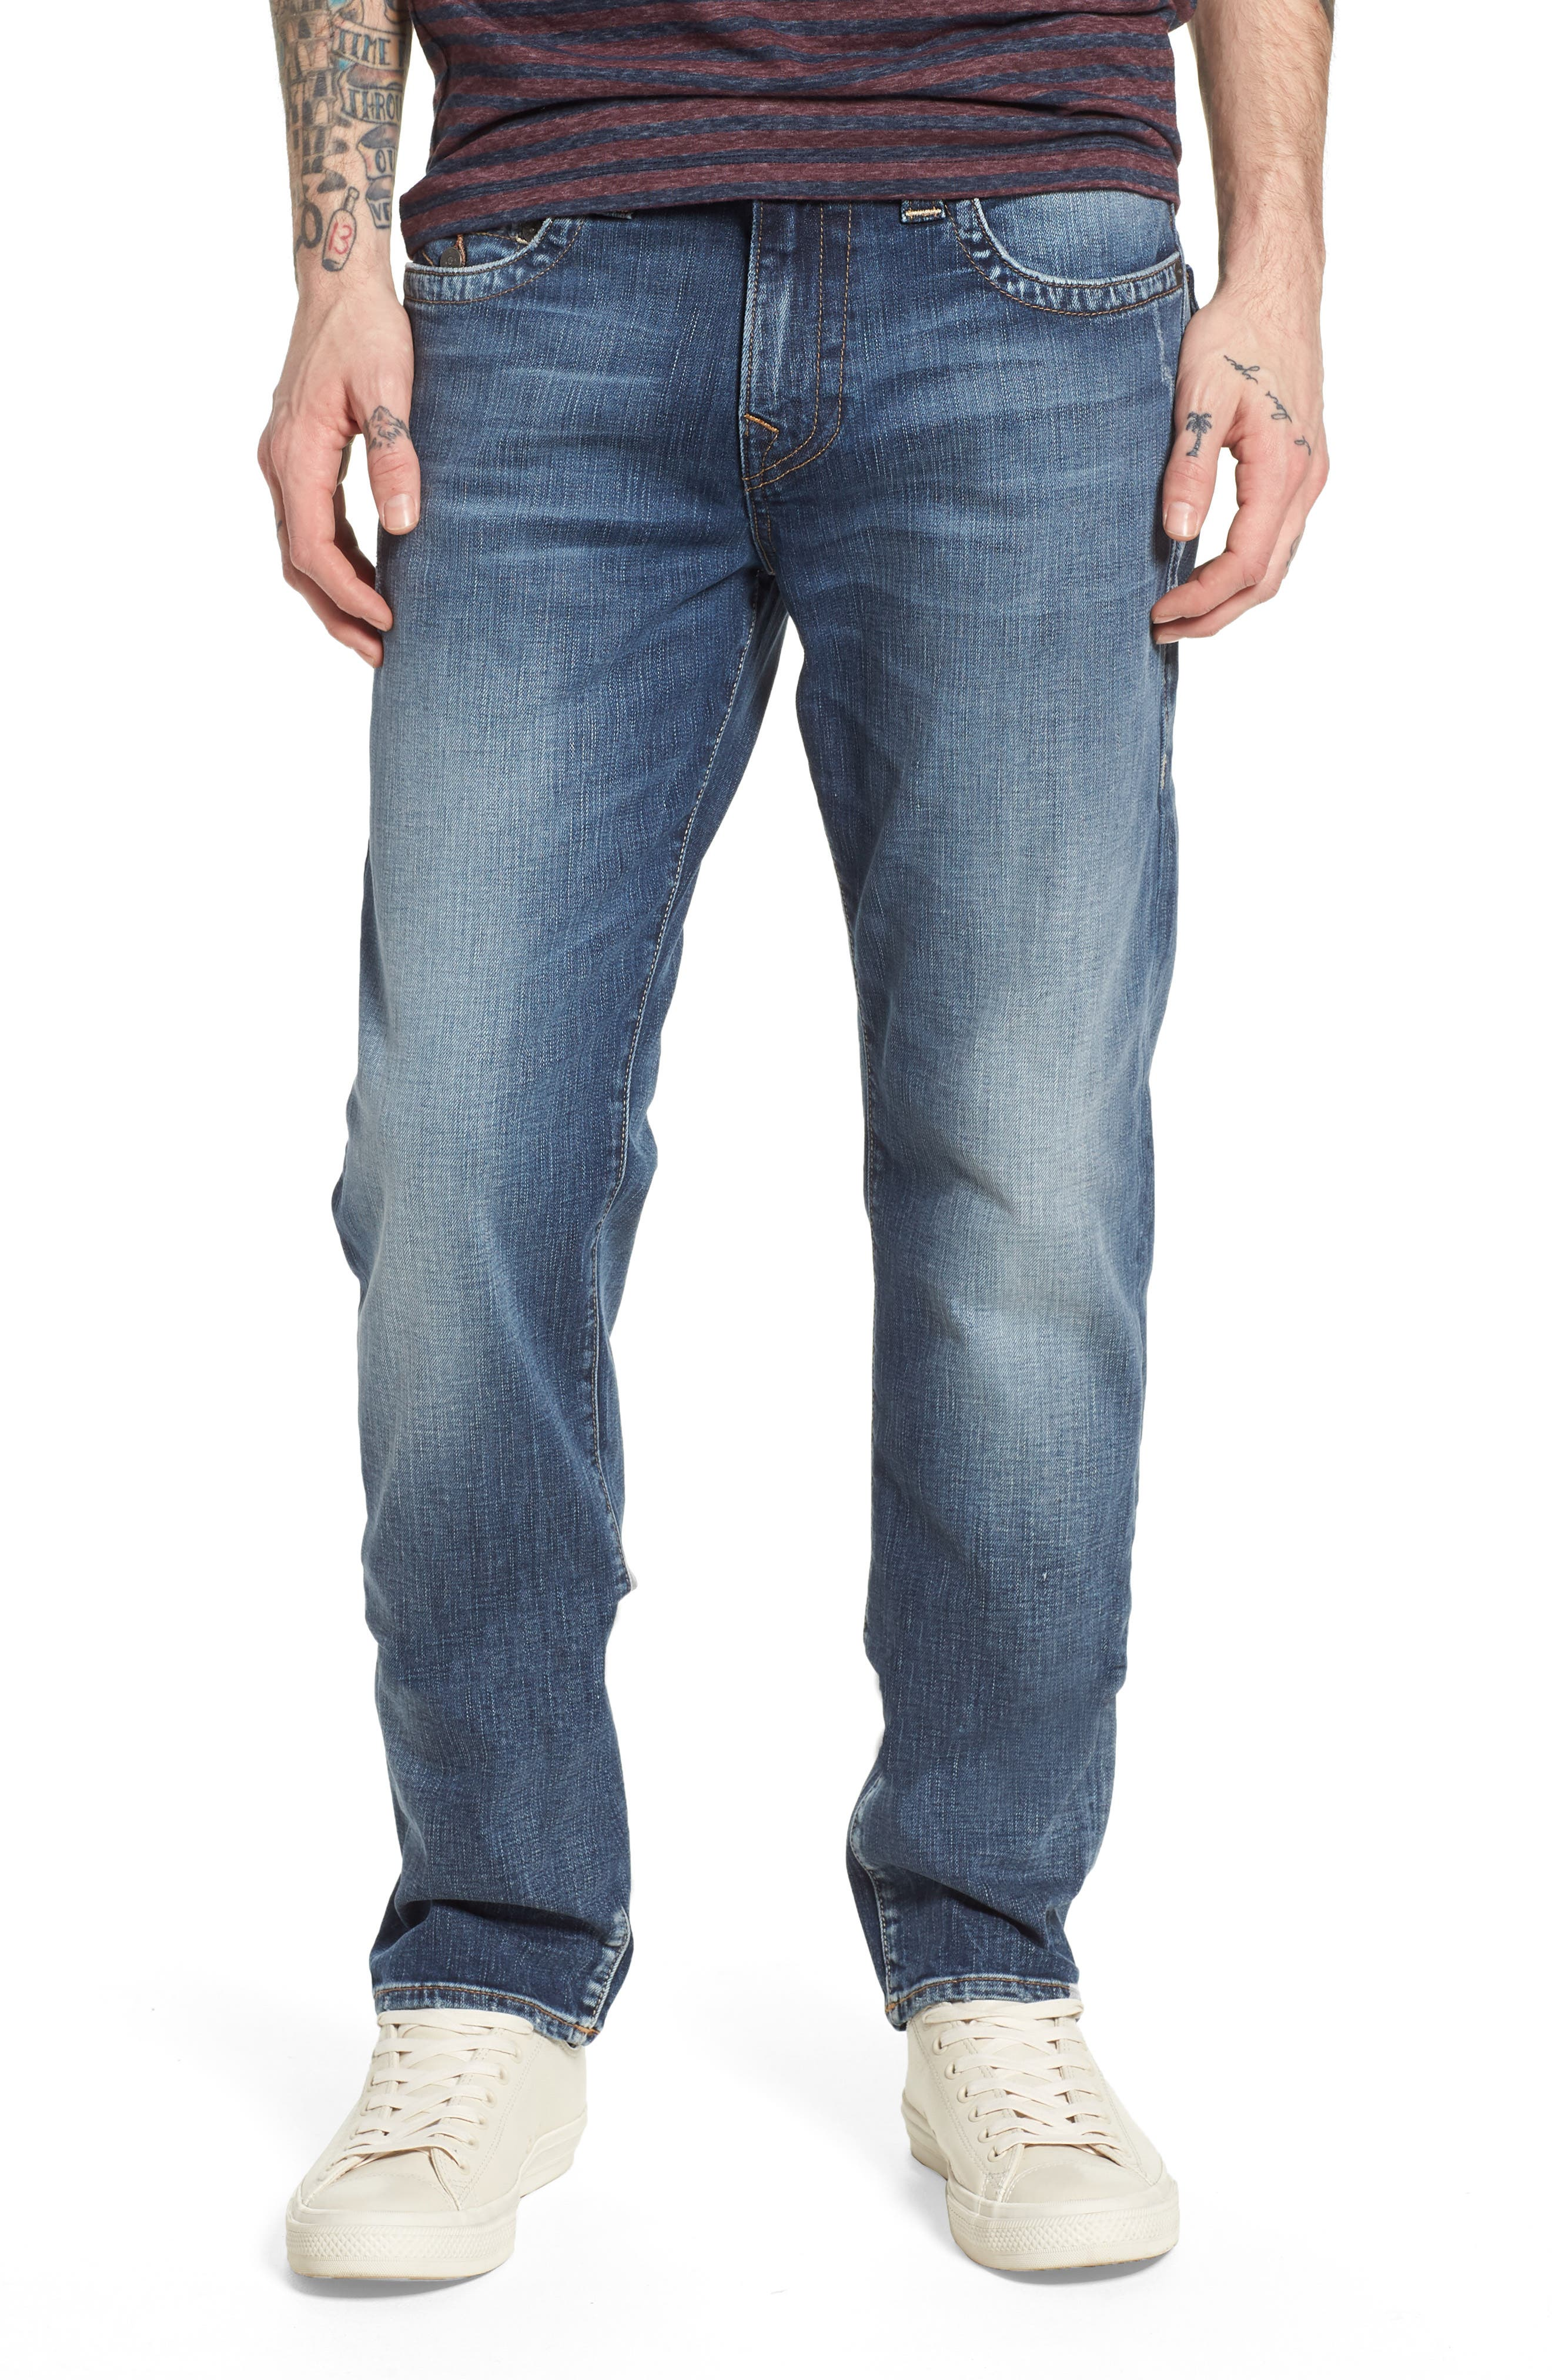 Geno Straight Leg Jeans,                             Main thumbnail 1, color,                             401